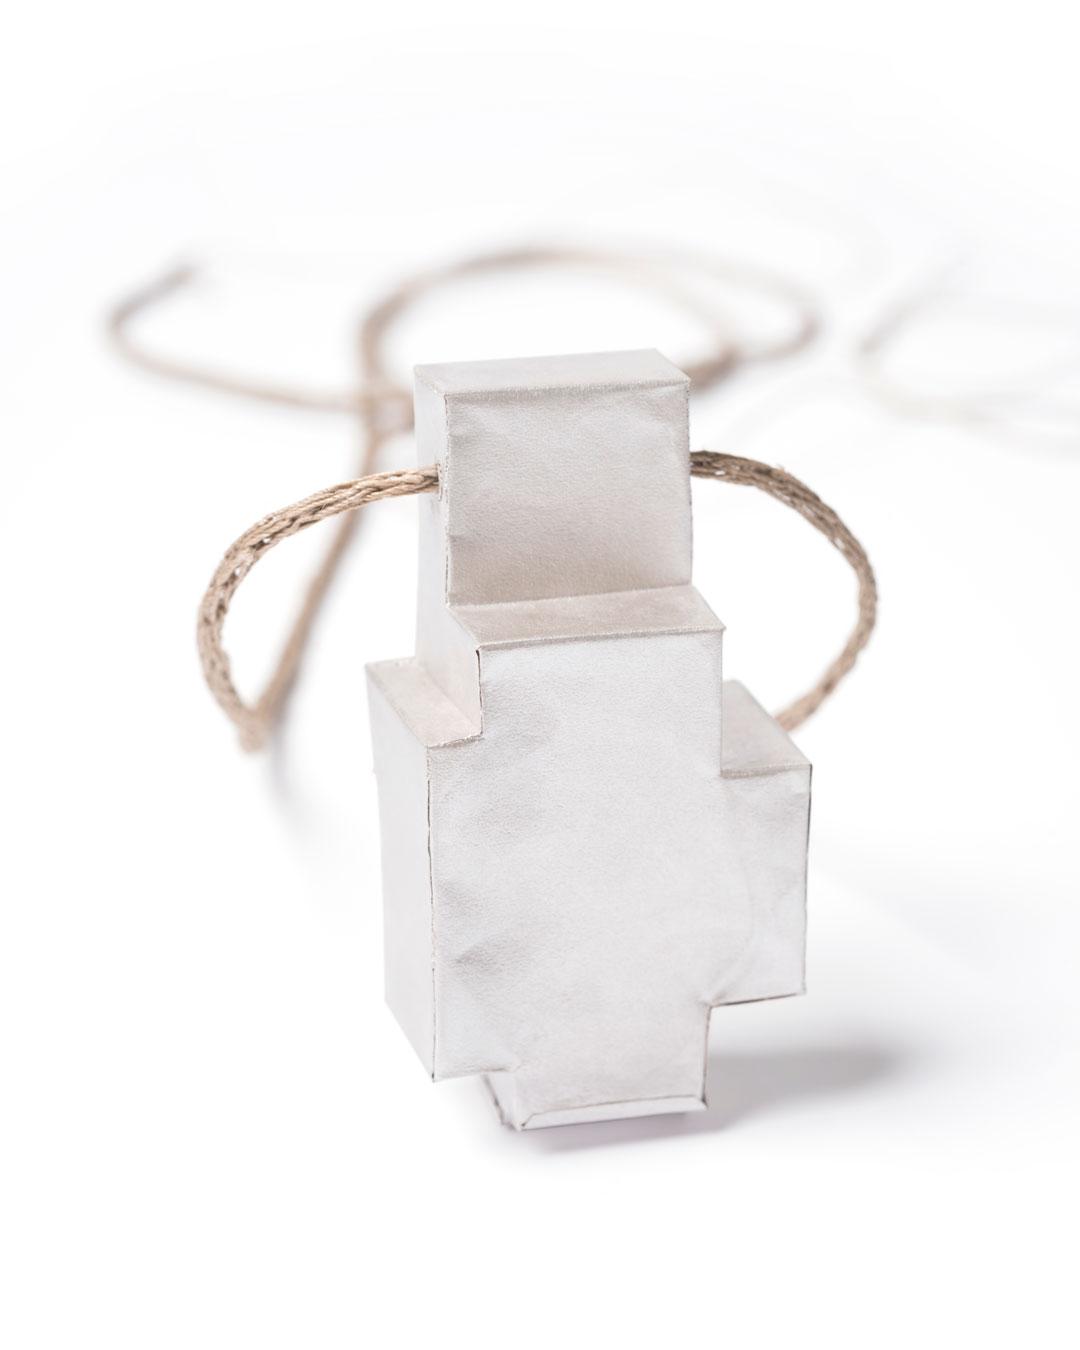 Carla Nuis, Unfurl 1, 2018, pendant; fine silver, linen, 57 x 30 x 18 mm, €710